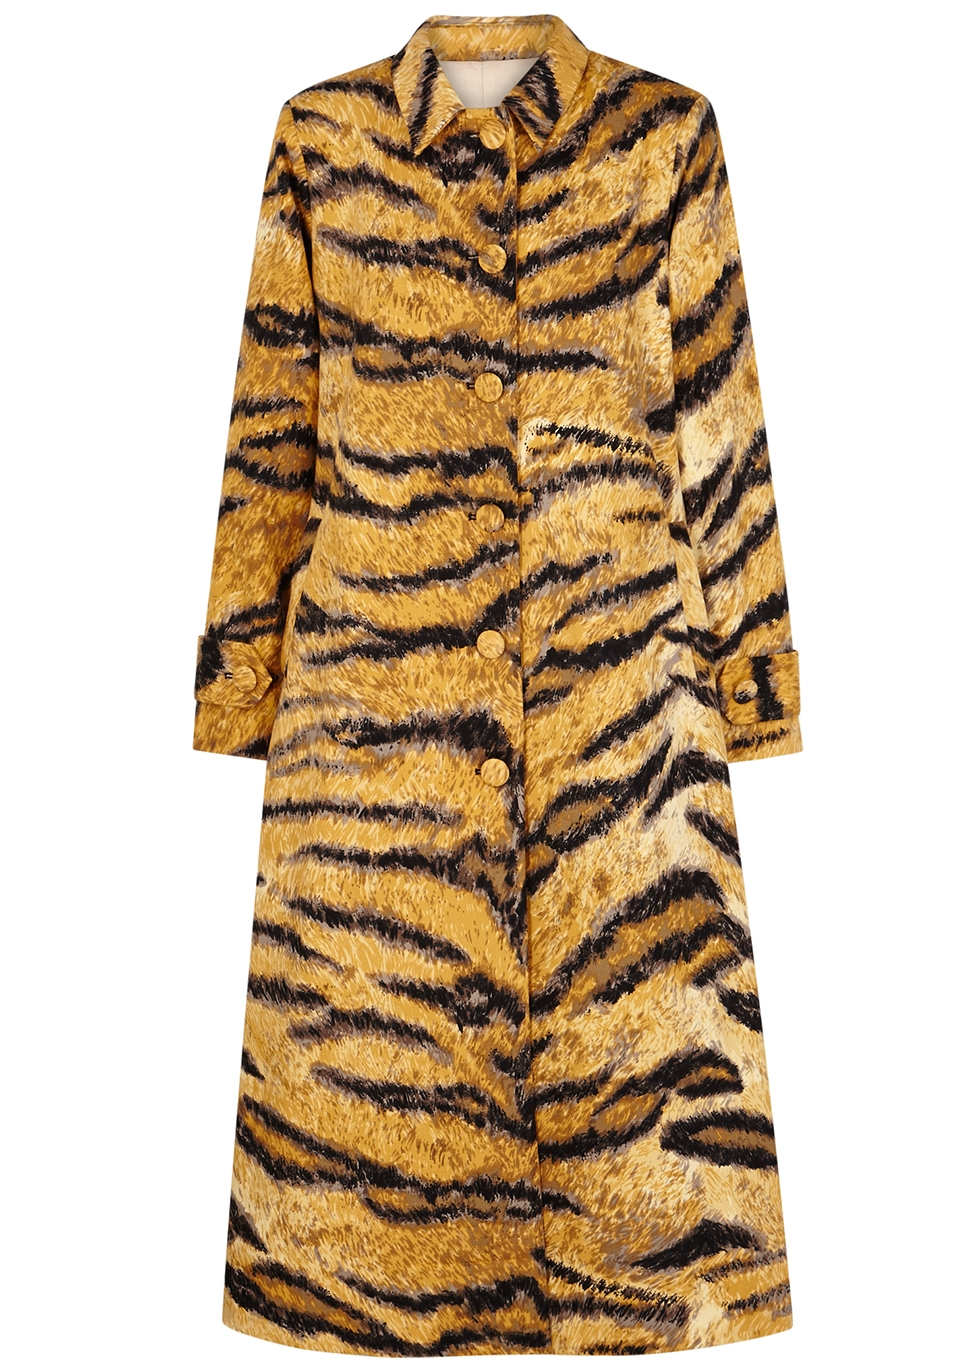 Christelle tiger-print cotton jacket - Hofmann